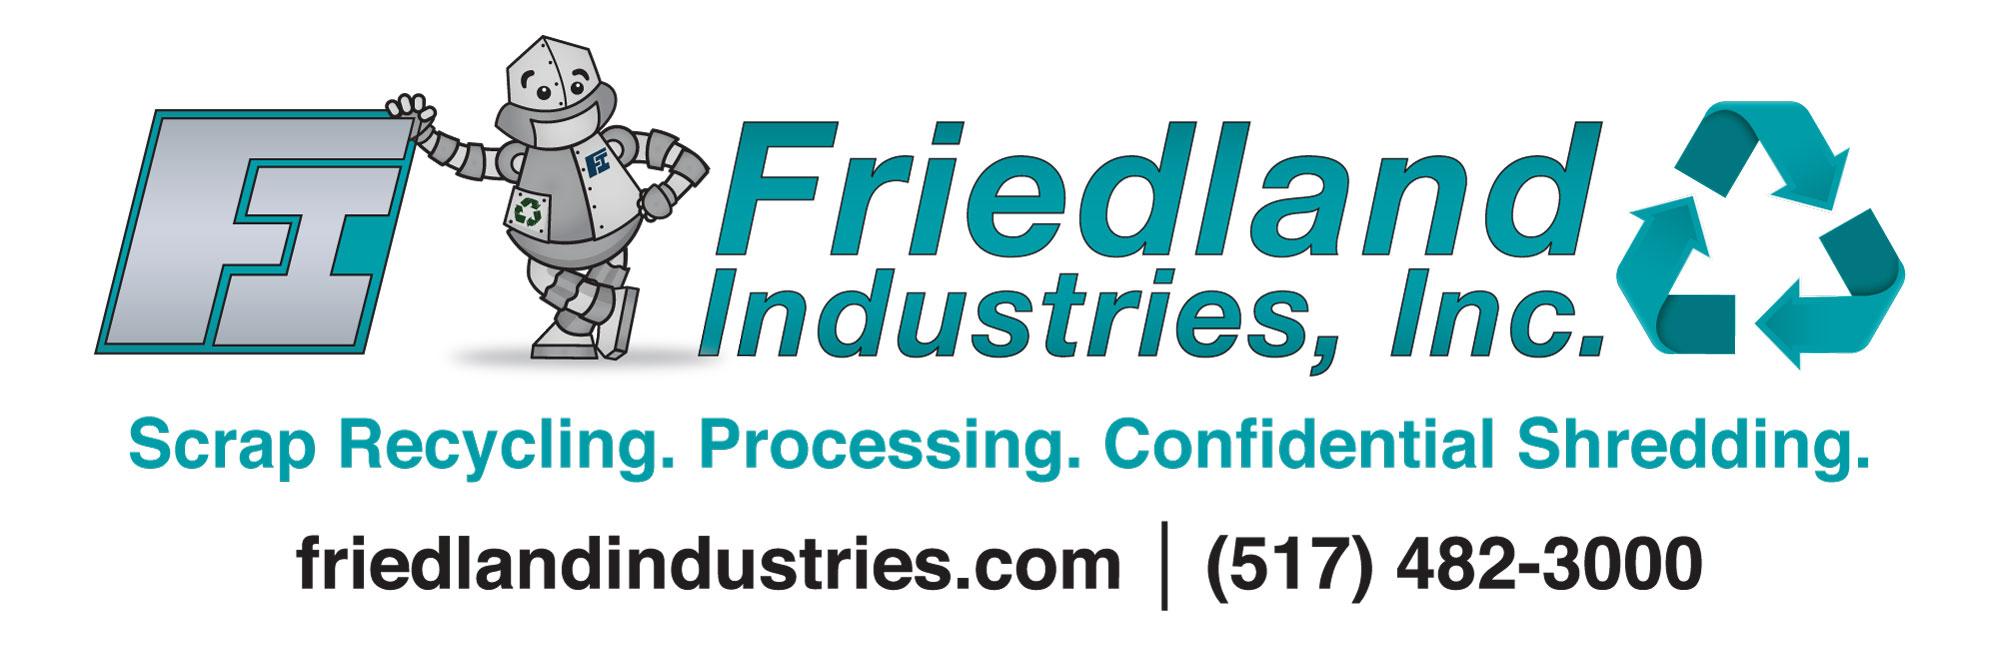 friedland_logo_all_2018.jpg